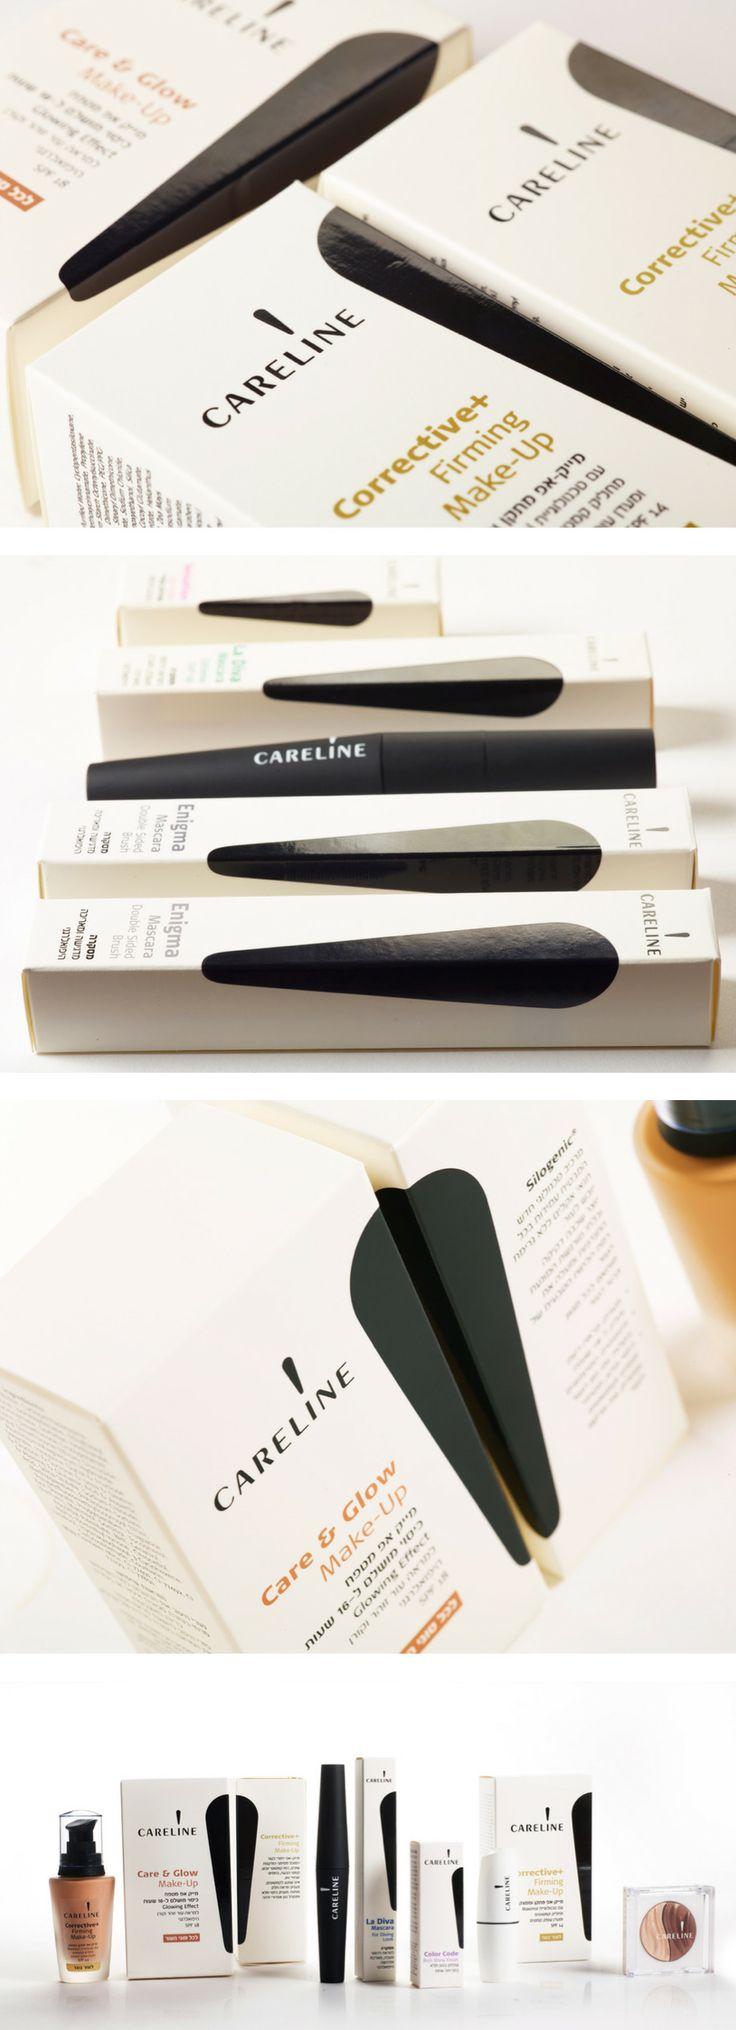 Careline Cosmetics #packaging